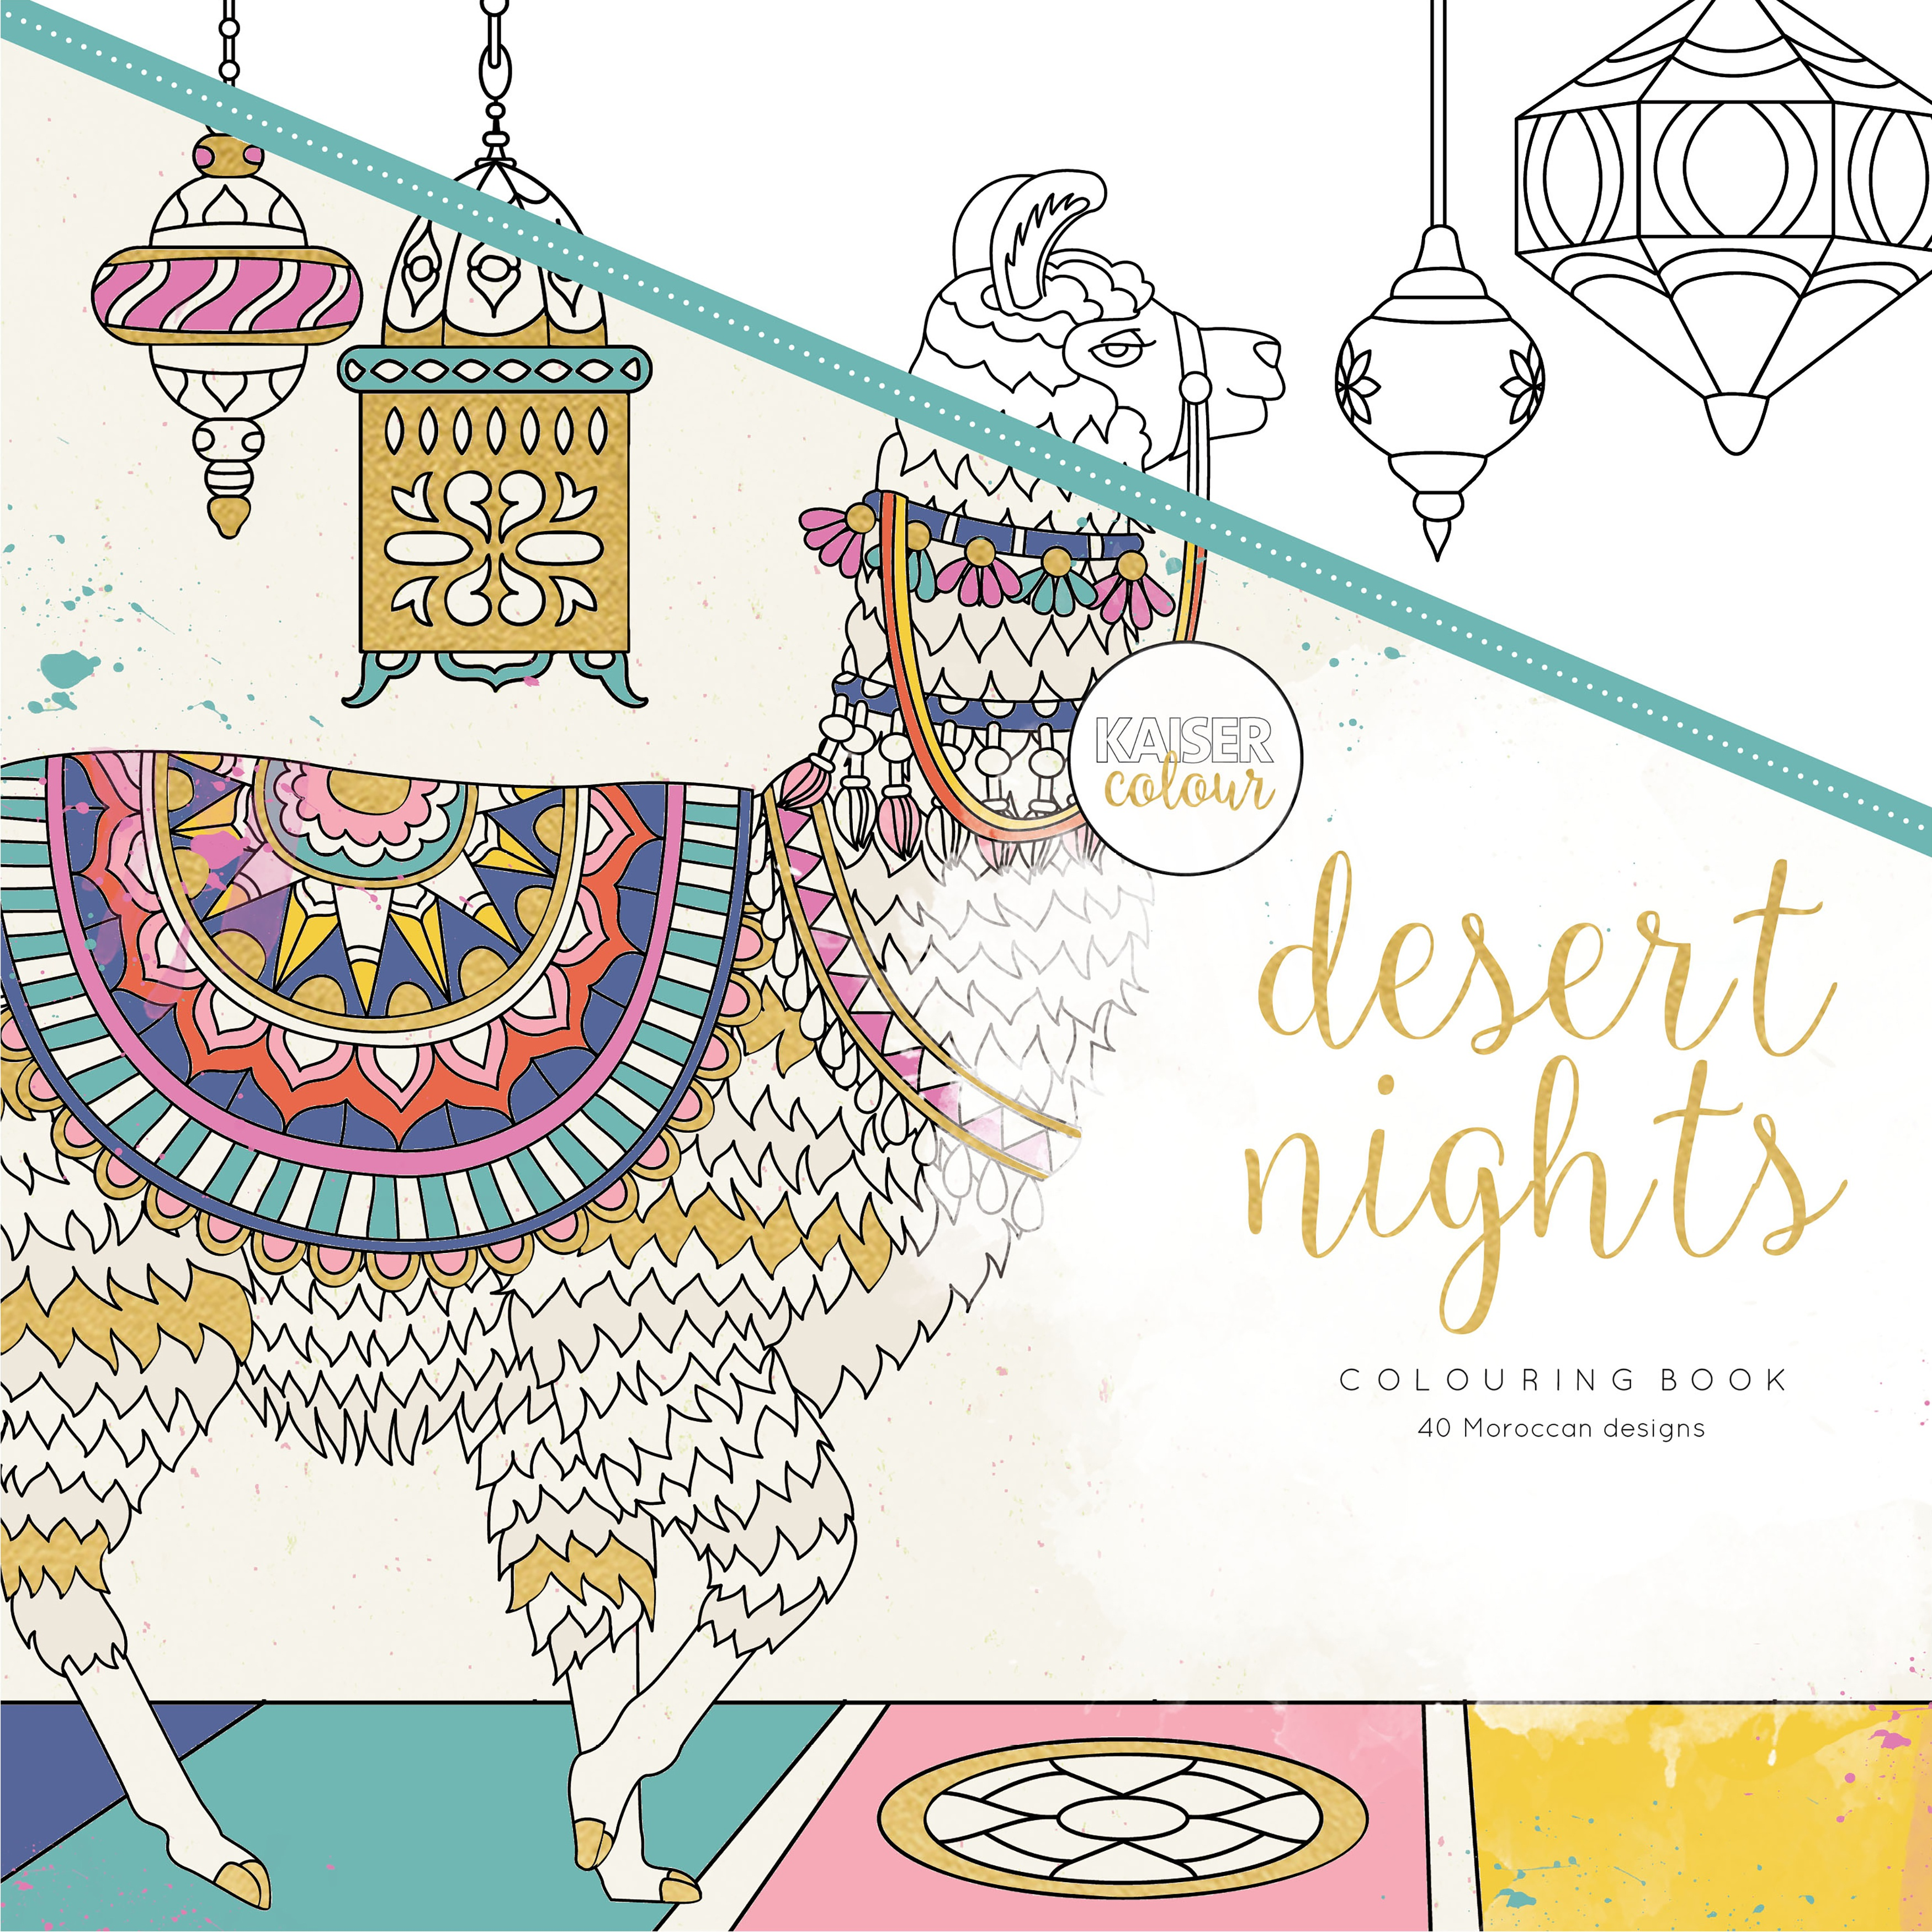 KaiserColour Perfect Bound Coloring Book 9.75X9.75-Desert Nights